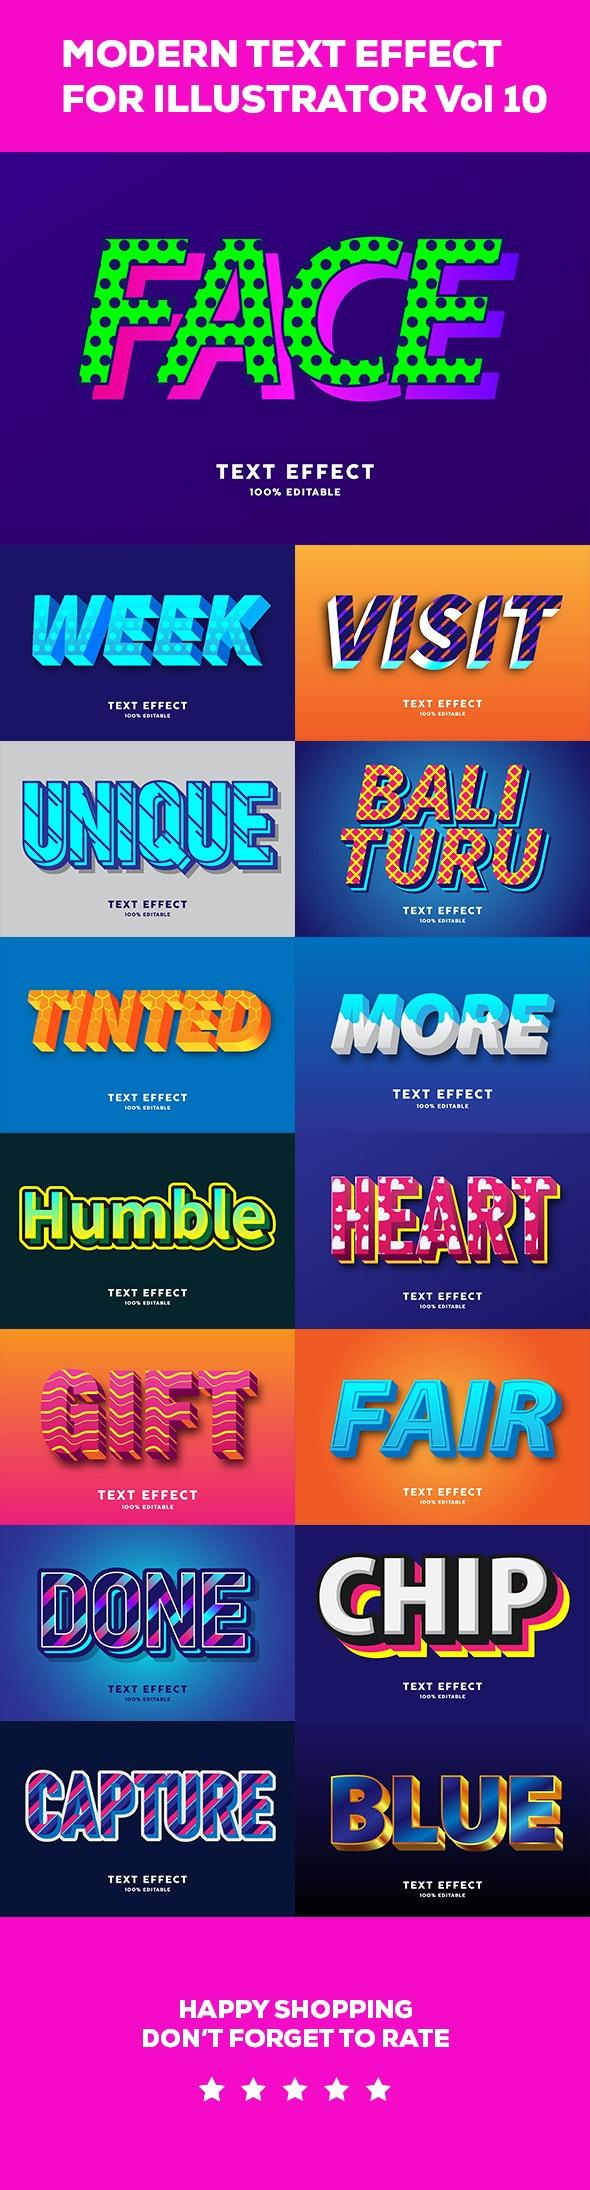 Text effect Modern vol 10 - Styles Illustrator